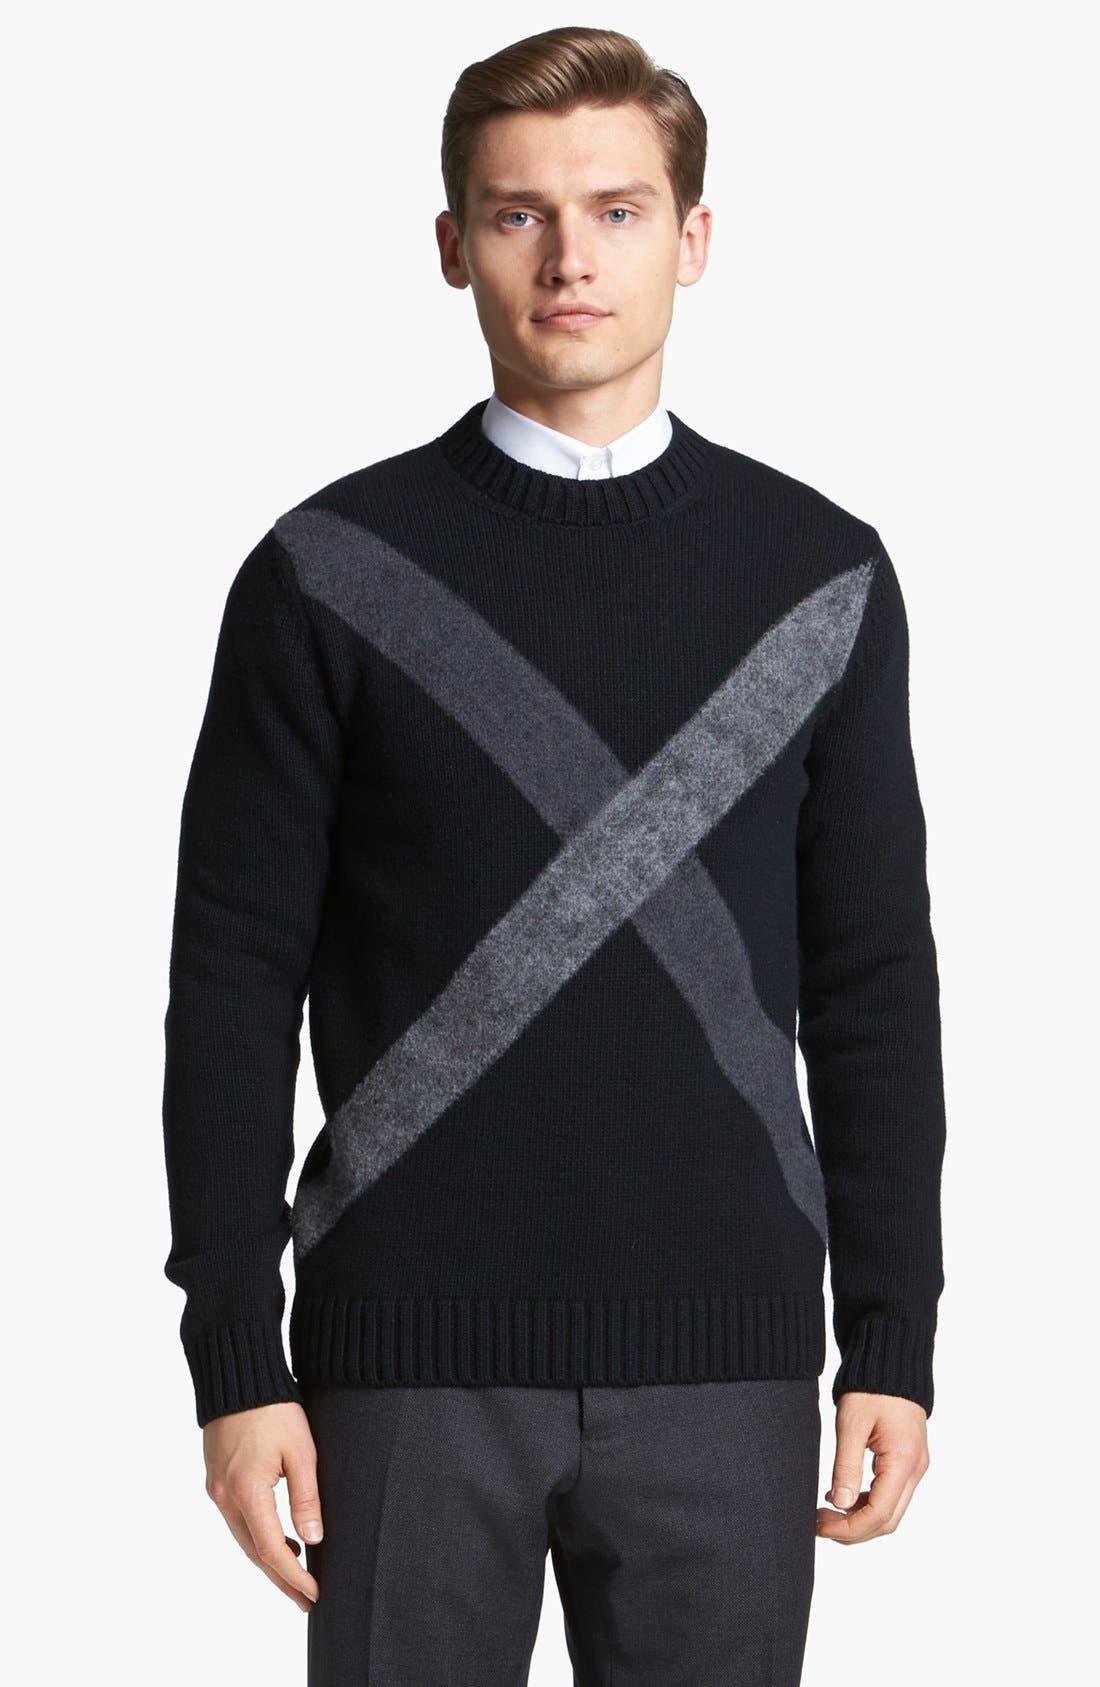 Alternate Image 1 Selected - Jil Sander Crewneck Sweater